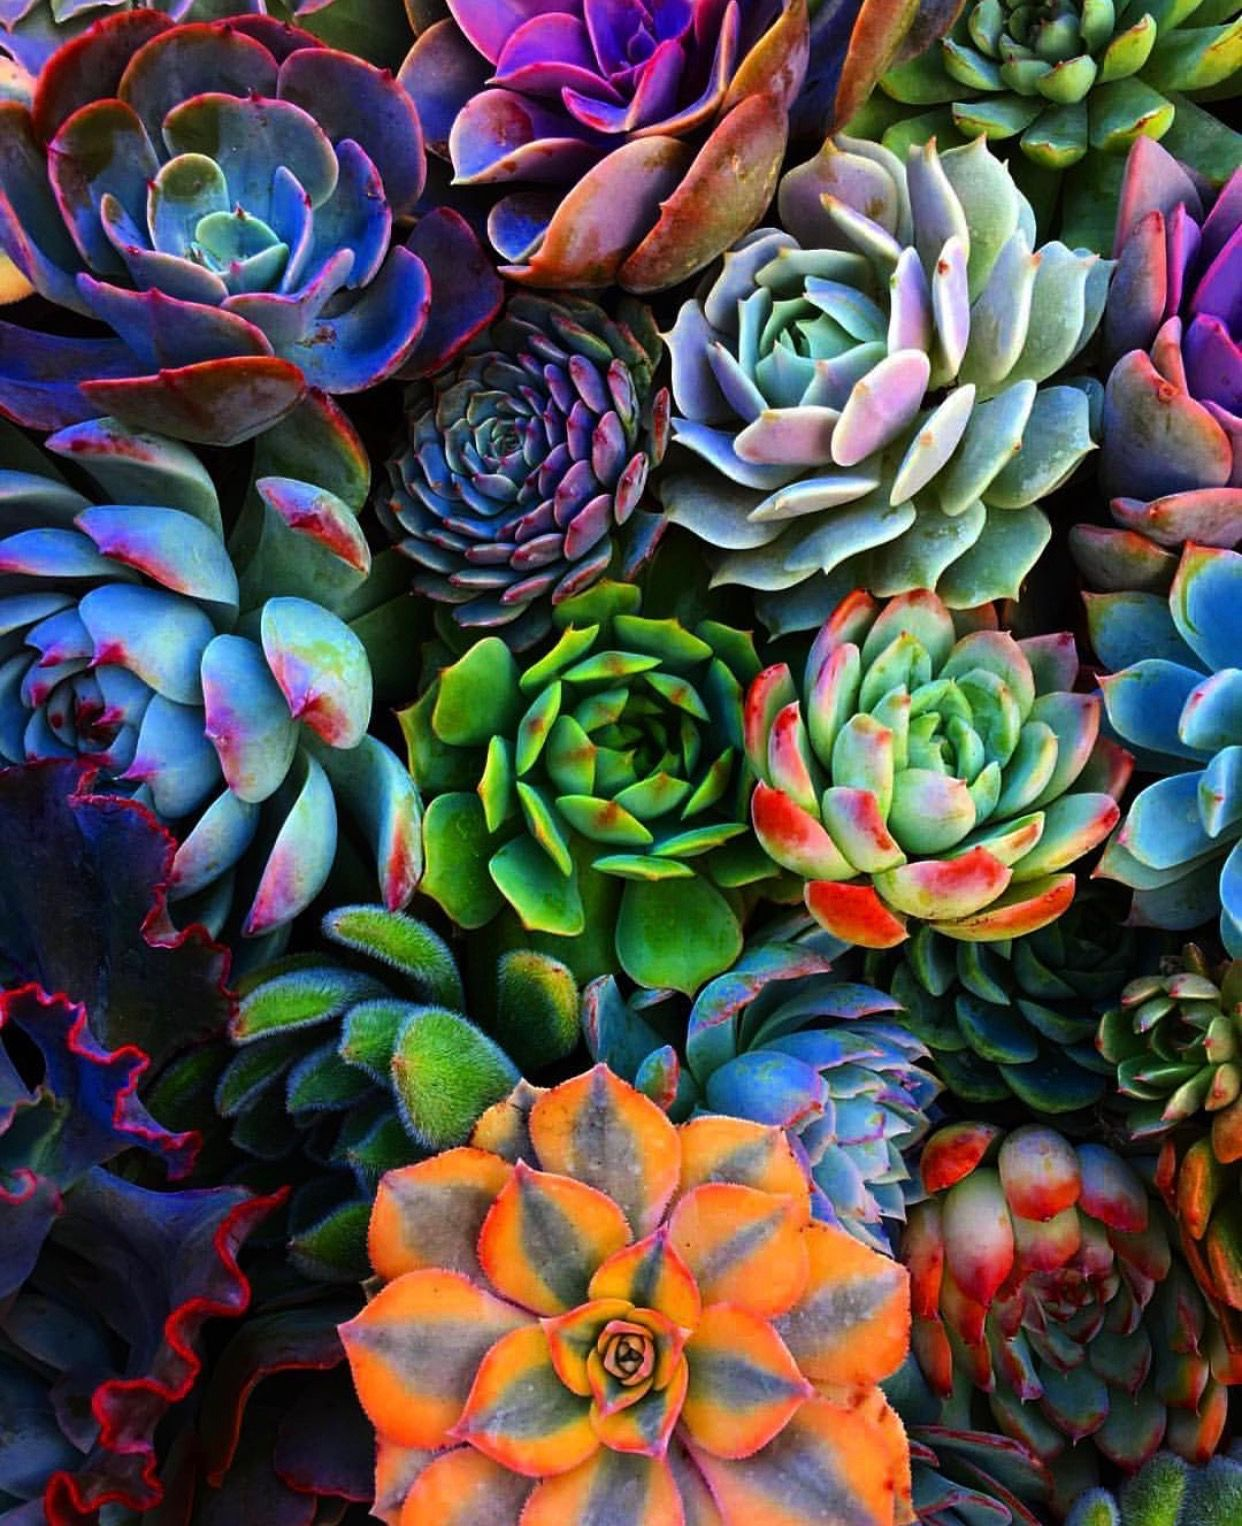 Nature flowers garden petals colors abstract plants wallpaper